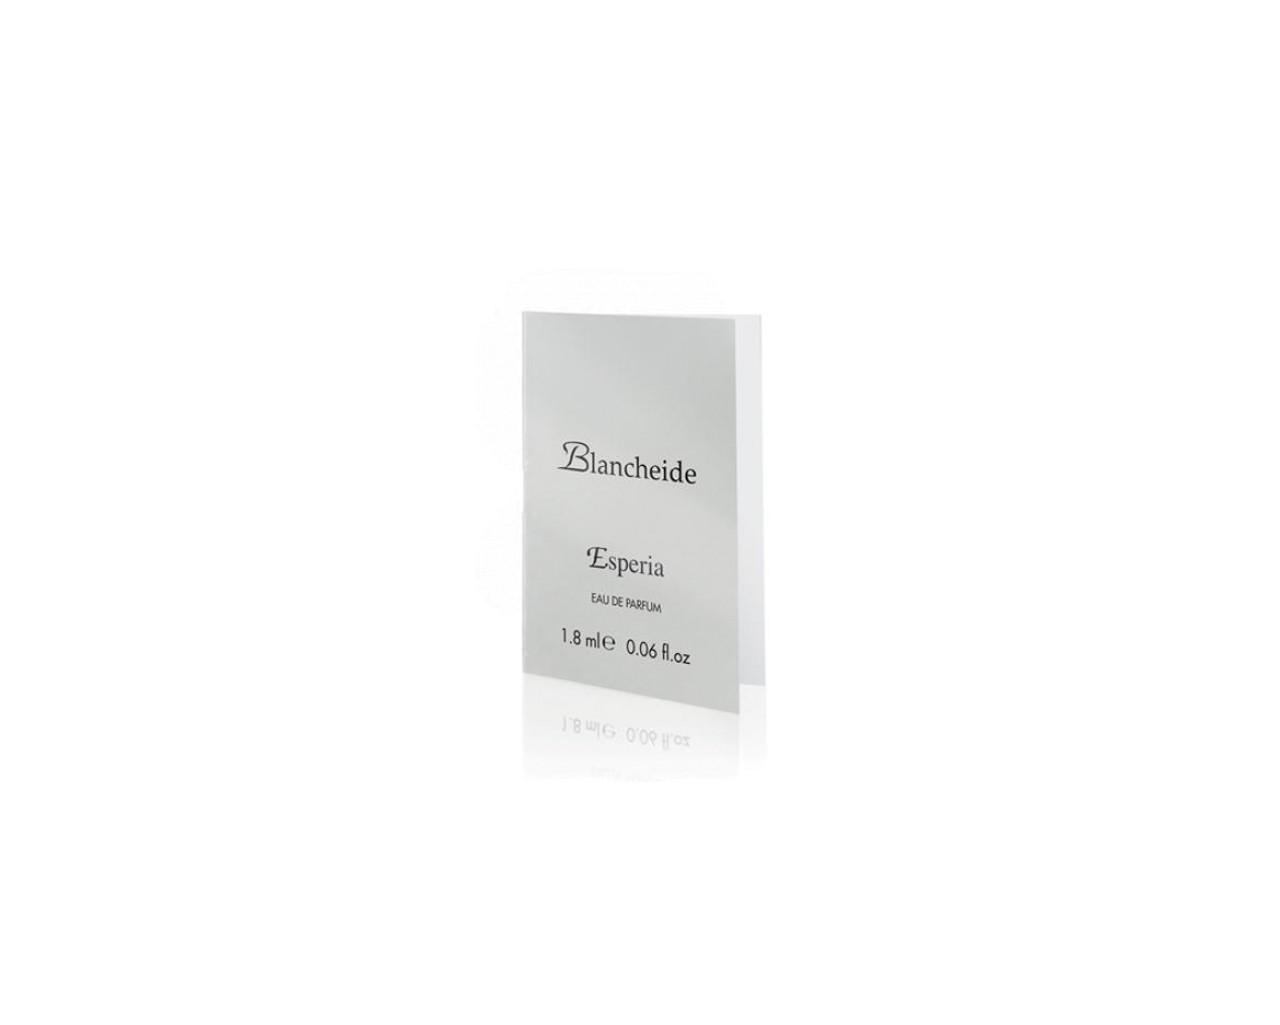 Campioncino Esperia Blancheide EDP 1,8 ml Blancheide BLAS001ES-02